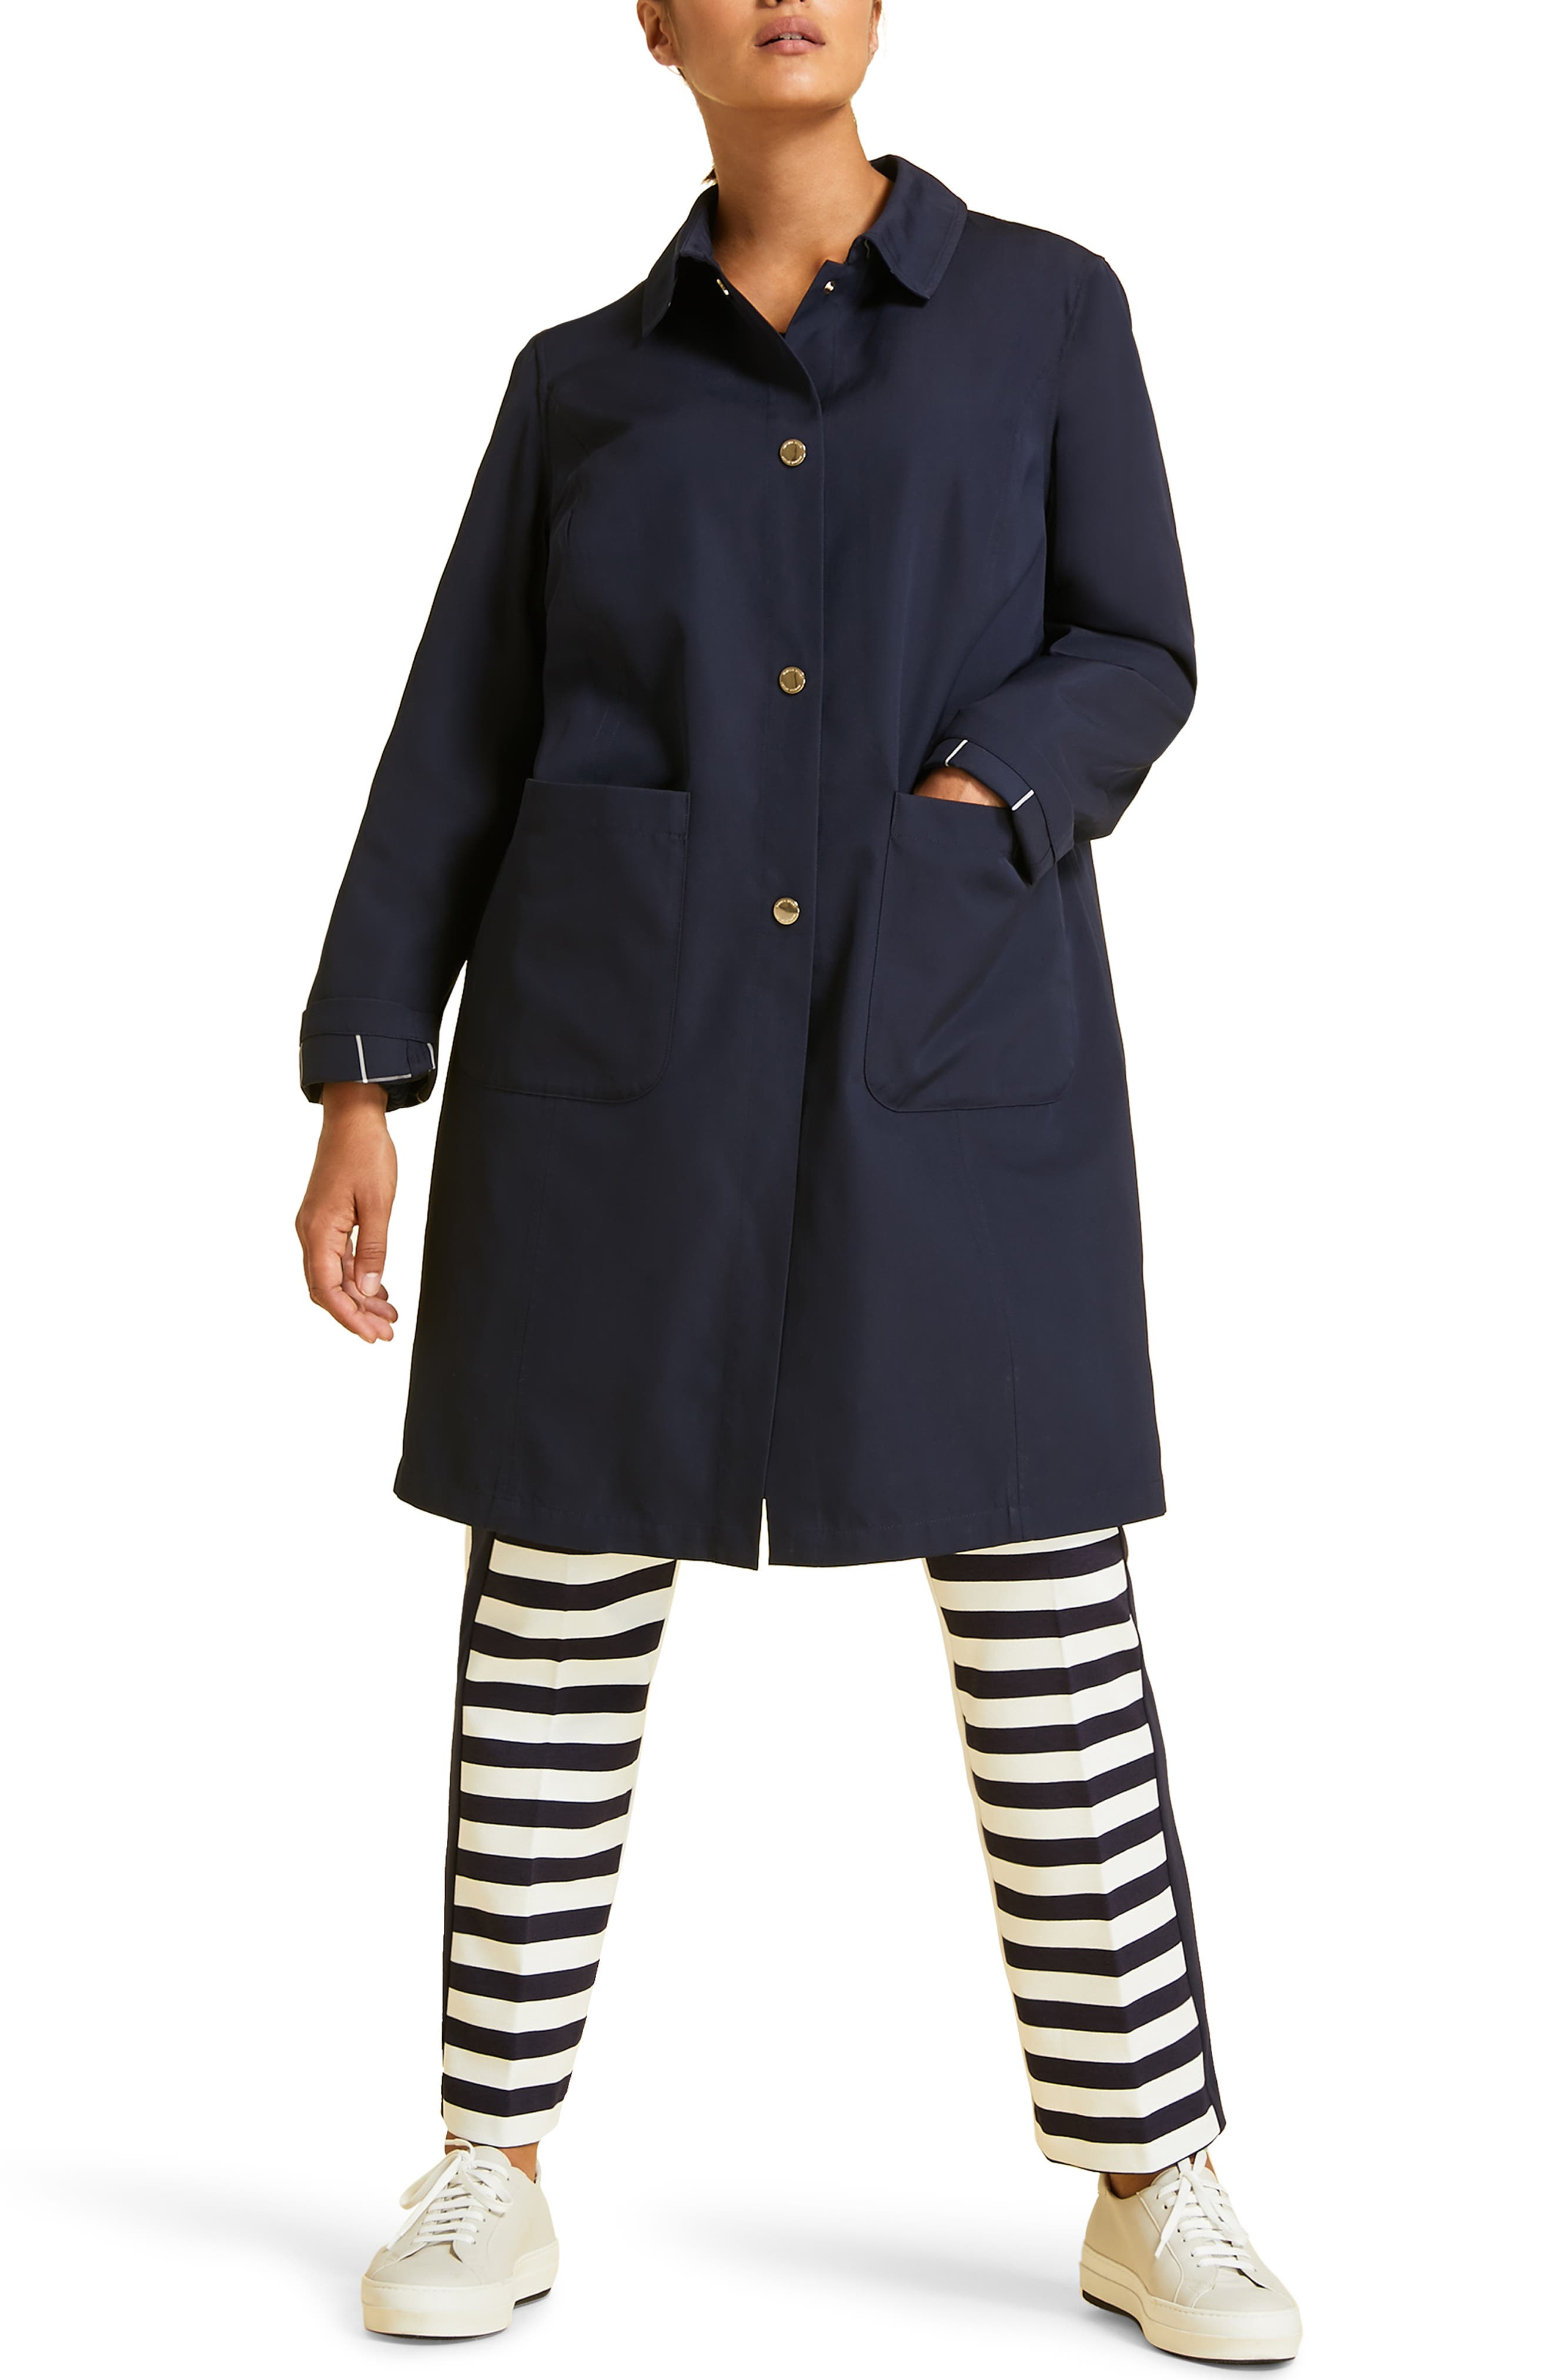 Tabella Reversible Raincoat, Main, color, NAVY BLUE